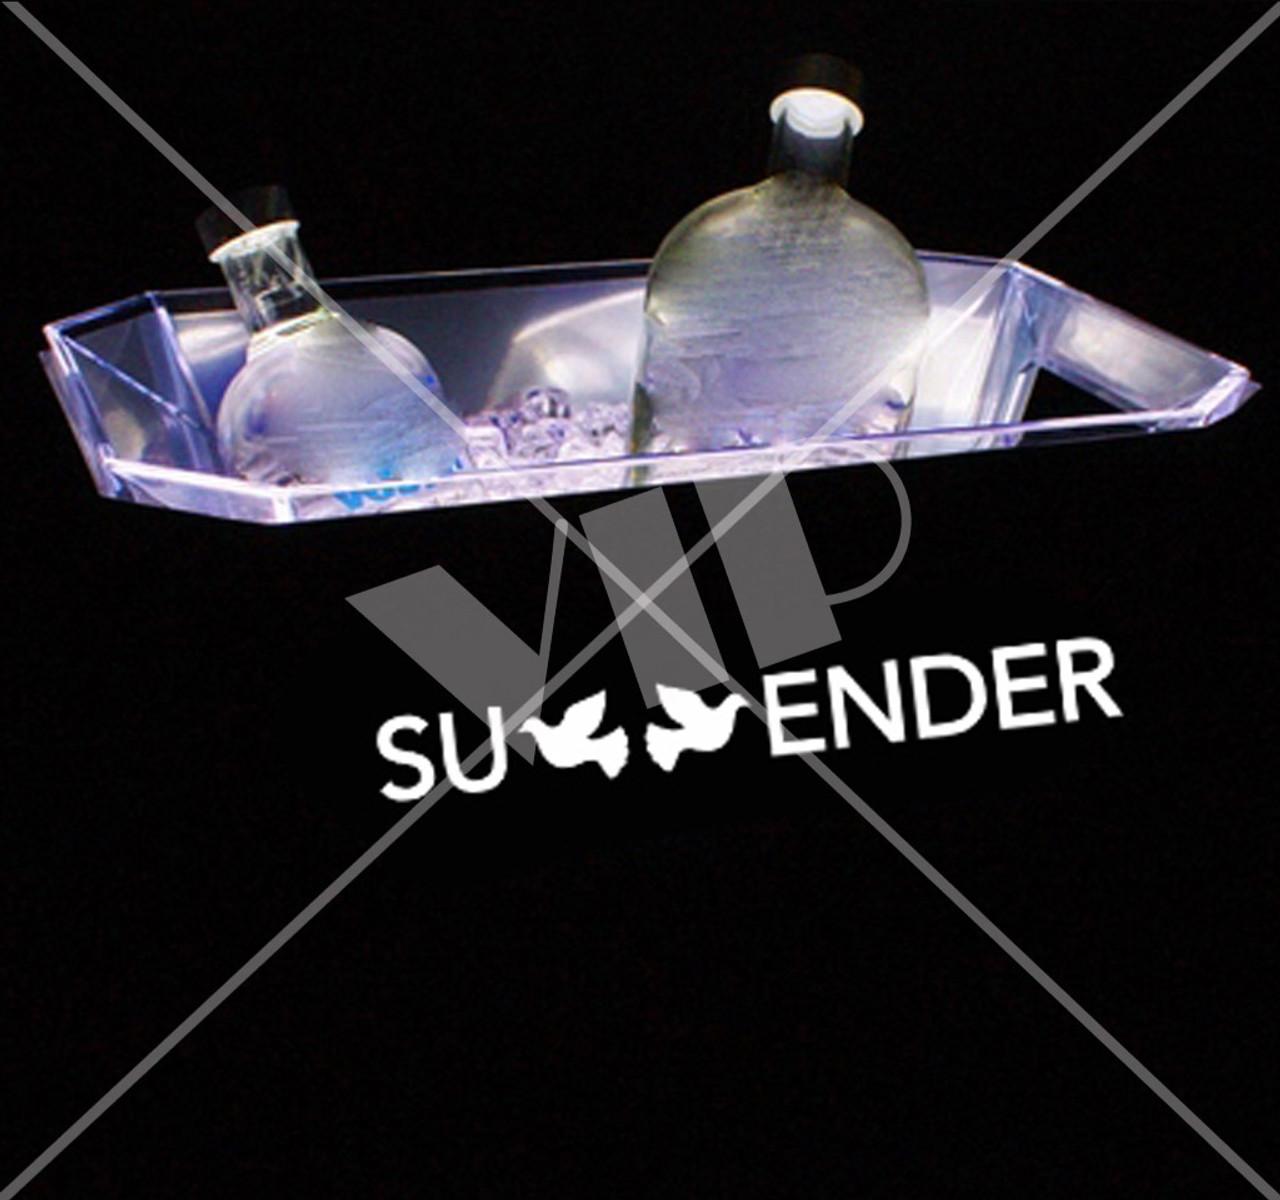 Surrender, Ice Bucket, Las Vegas, Nevada, california, LA, NYC, Miami, New york